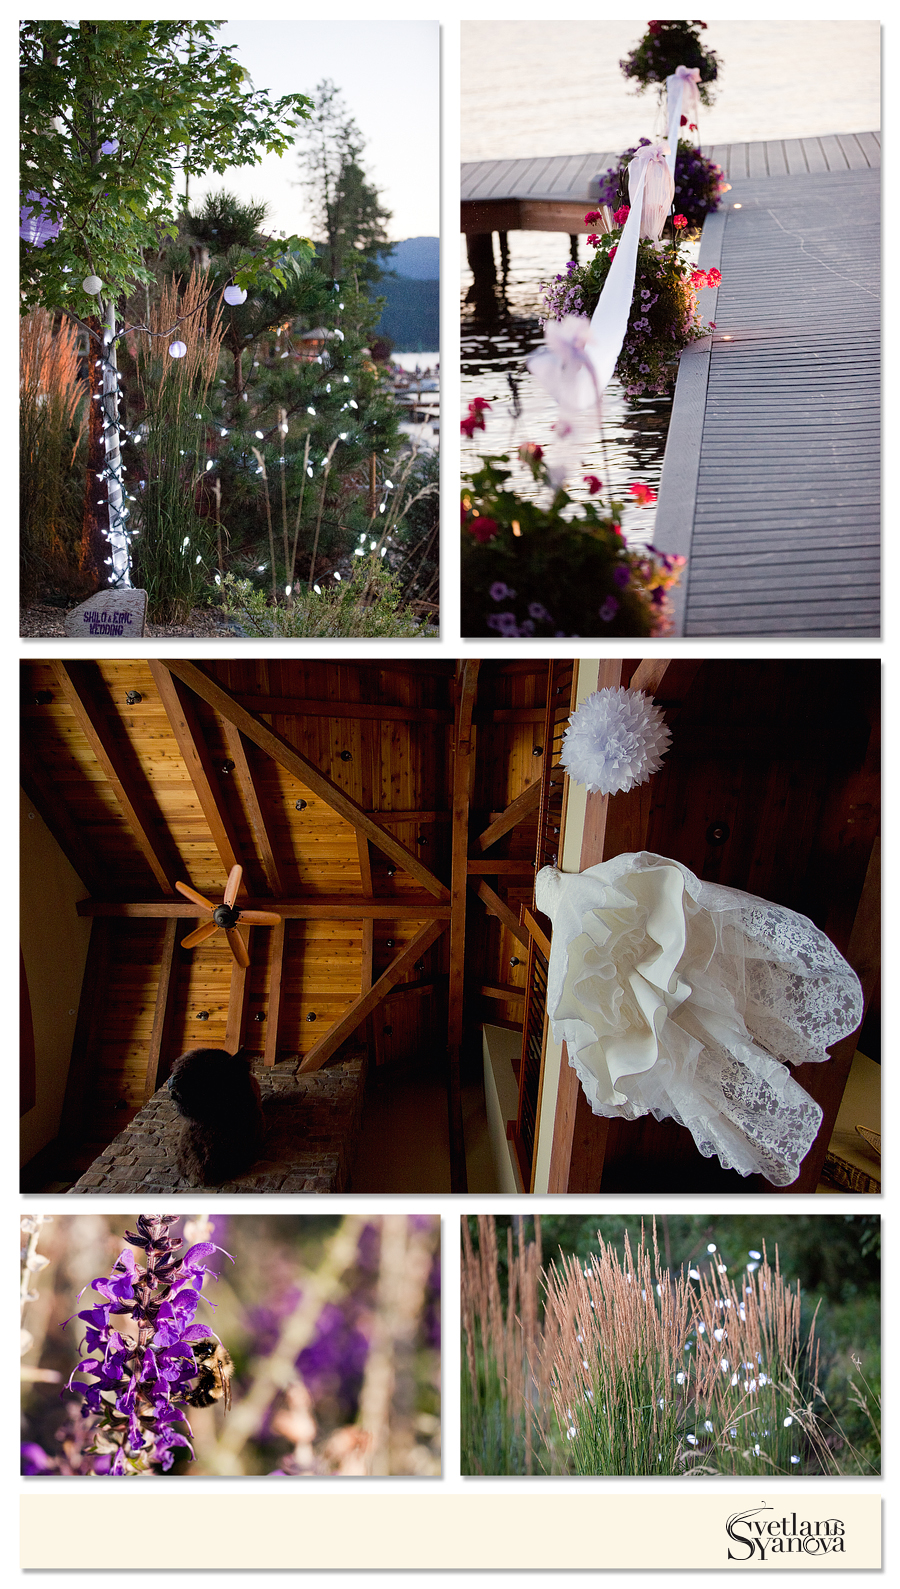 DIY wedding, british columbia wedding photographers, BC wedding photographers, vernon wedding photographers,Svetlana Yanova, chic and simple wedding , lake wedding, beautiful BC wedding photography, calgary wedding photography